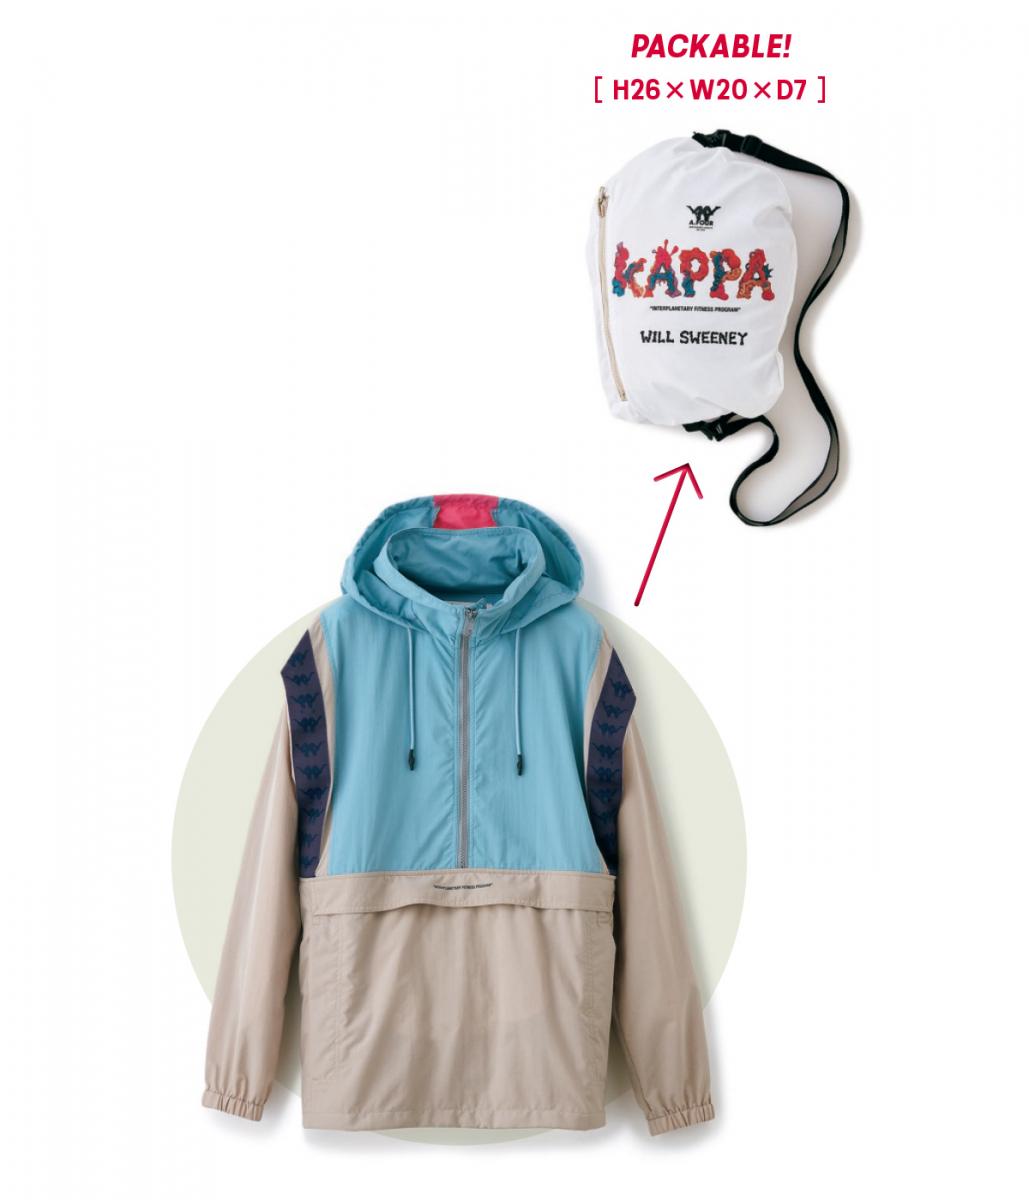 KAPPA × WILL SWEENEY × A.FOUR LABS